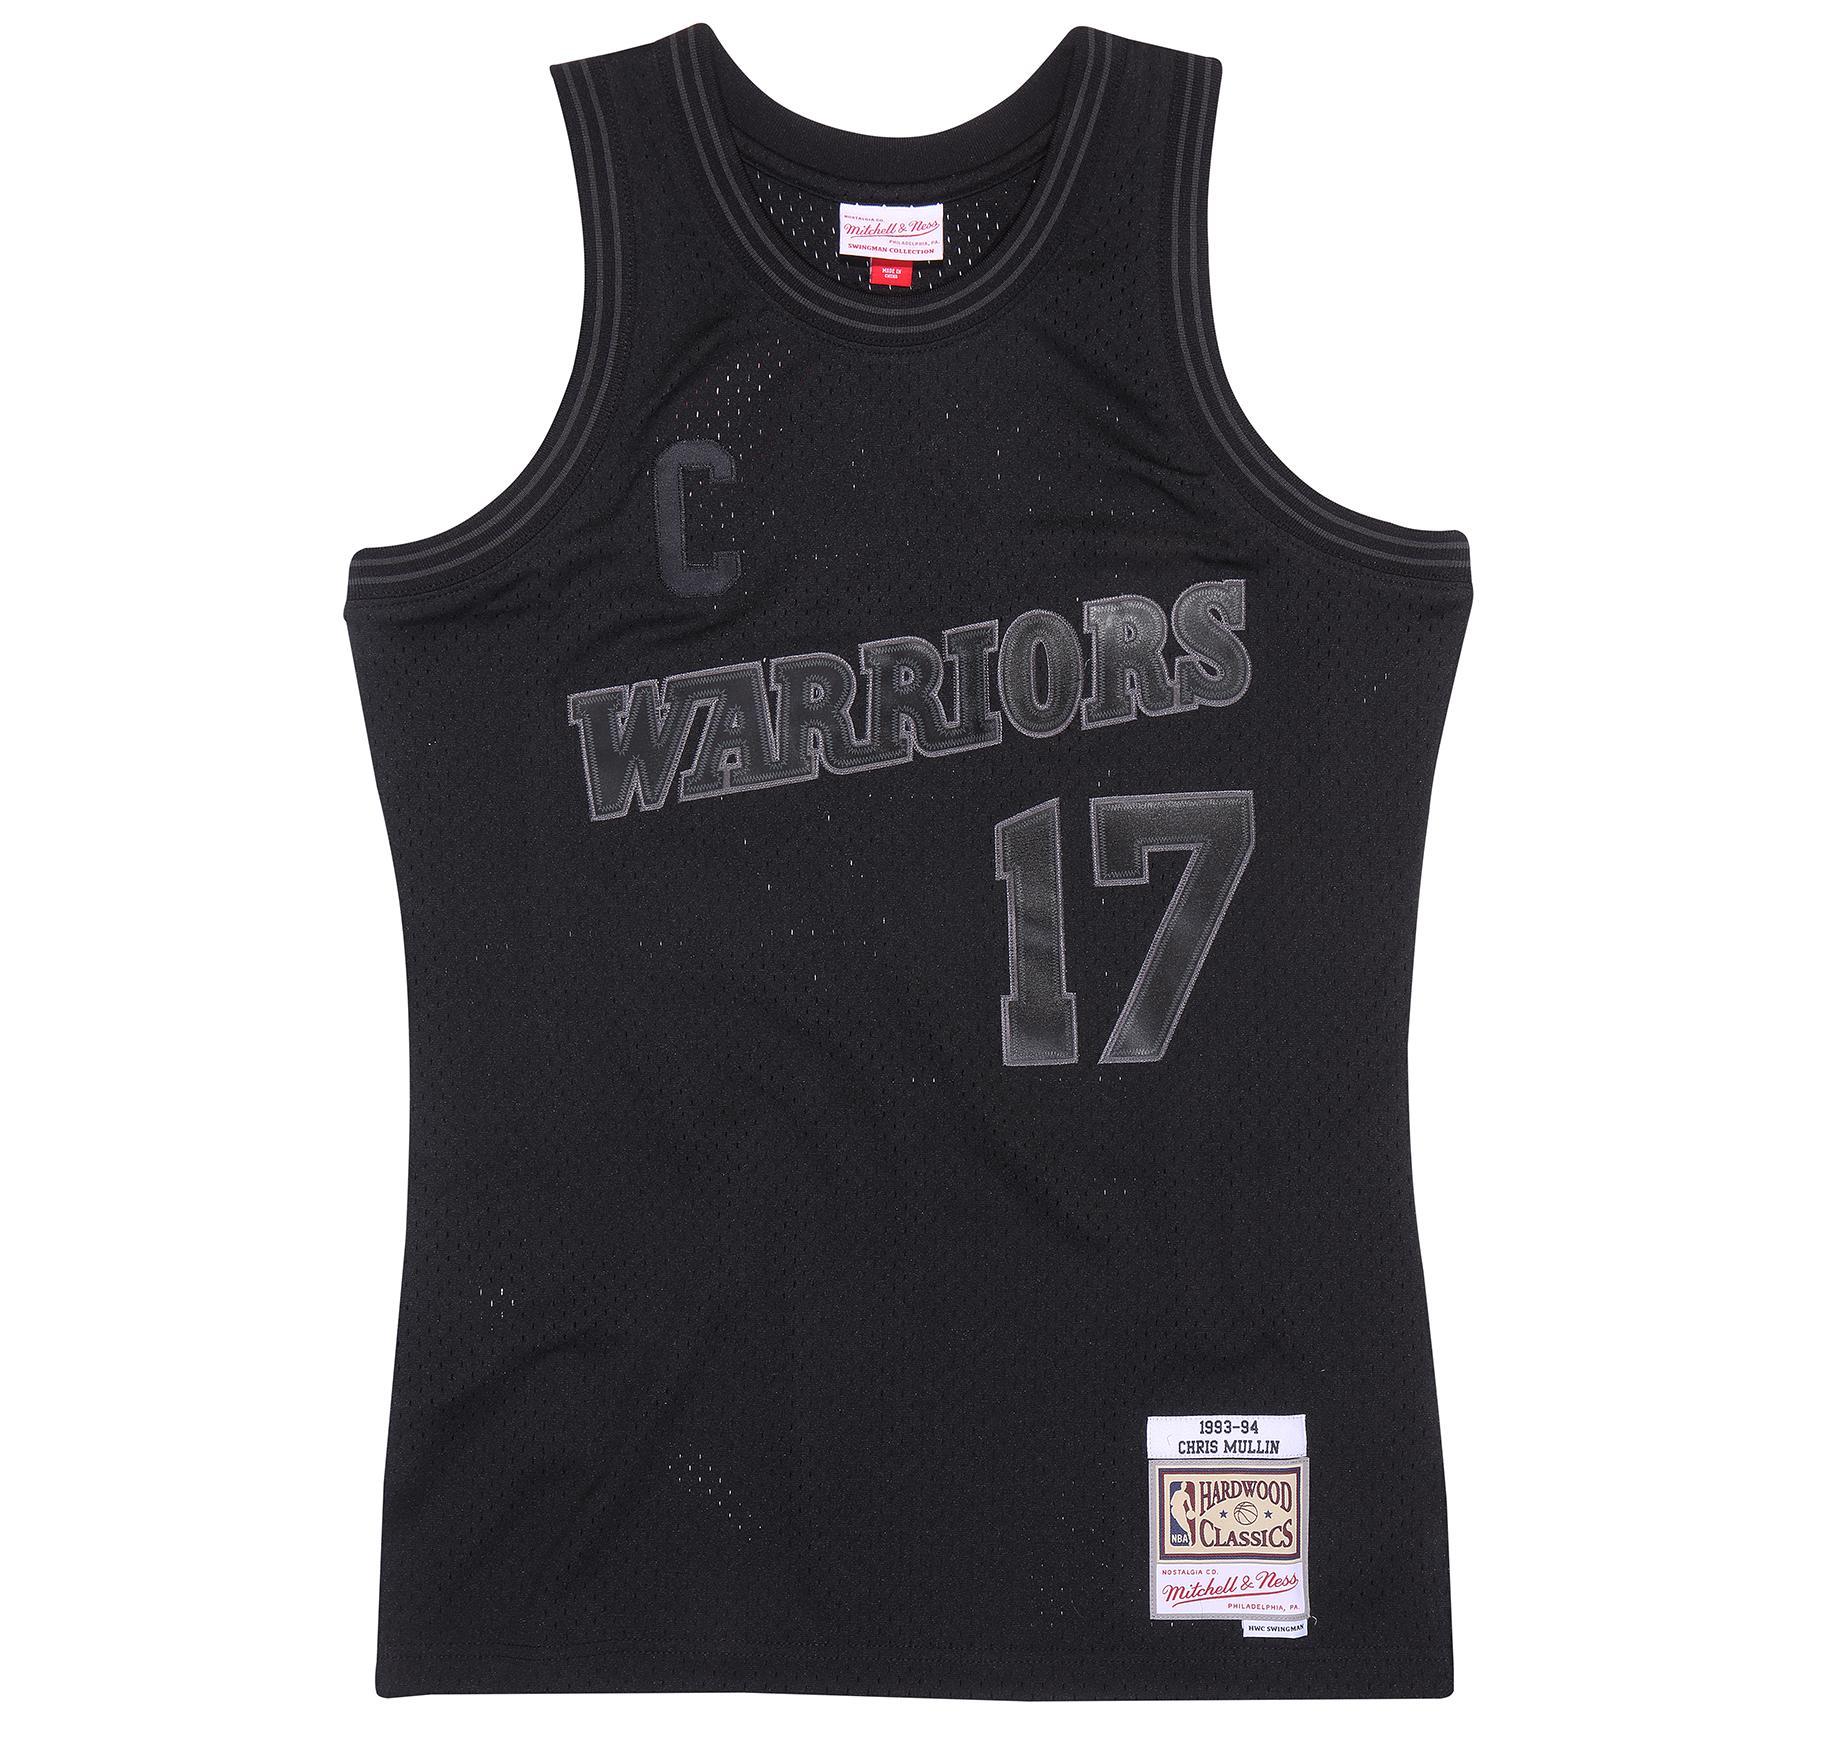 c751be4c2 Back to Black Chris Mullin Swingman Jersey Golden State Warriors